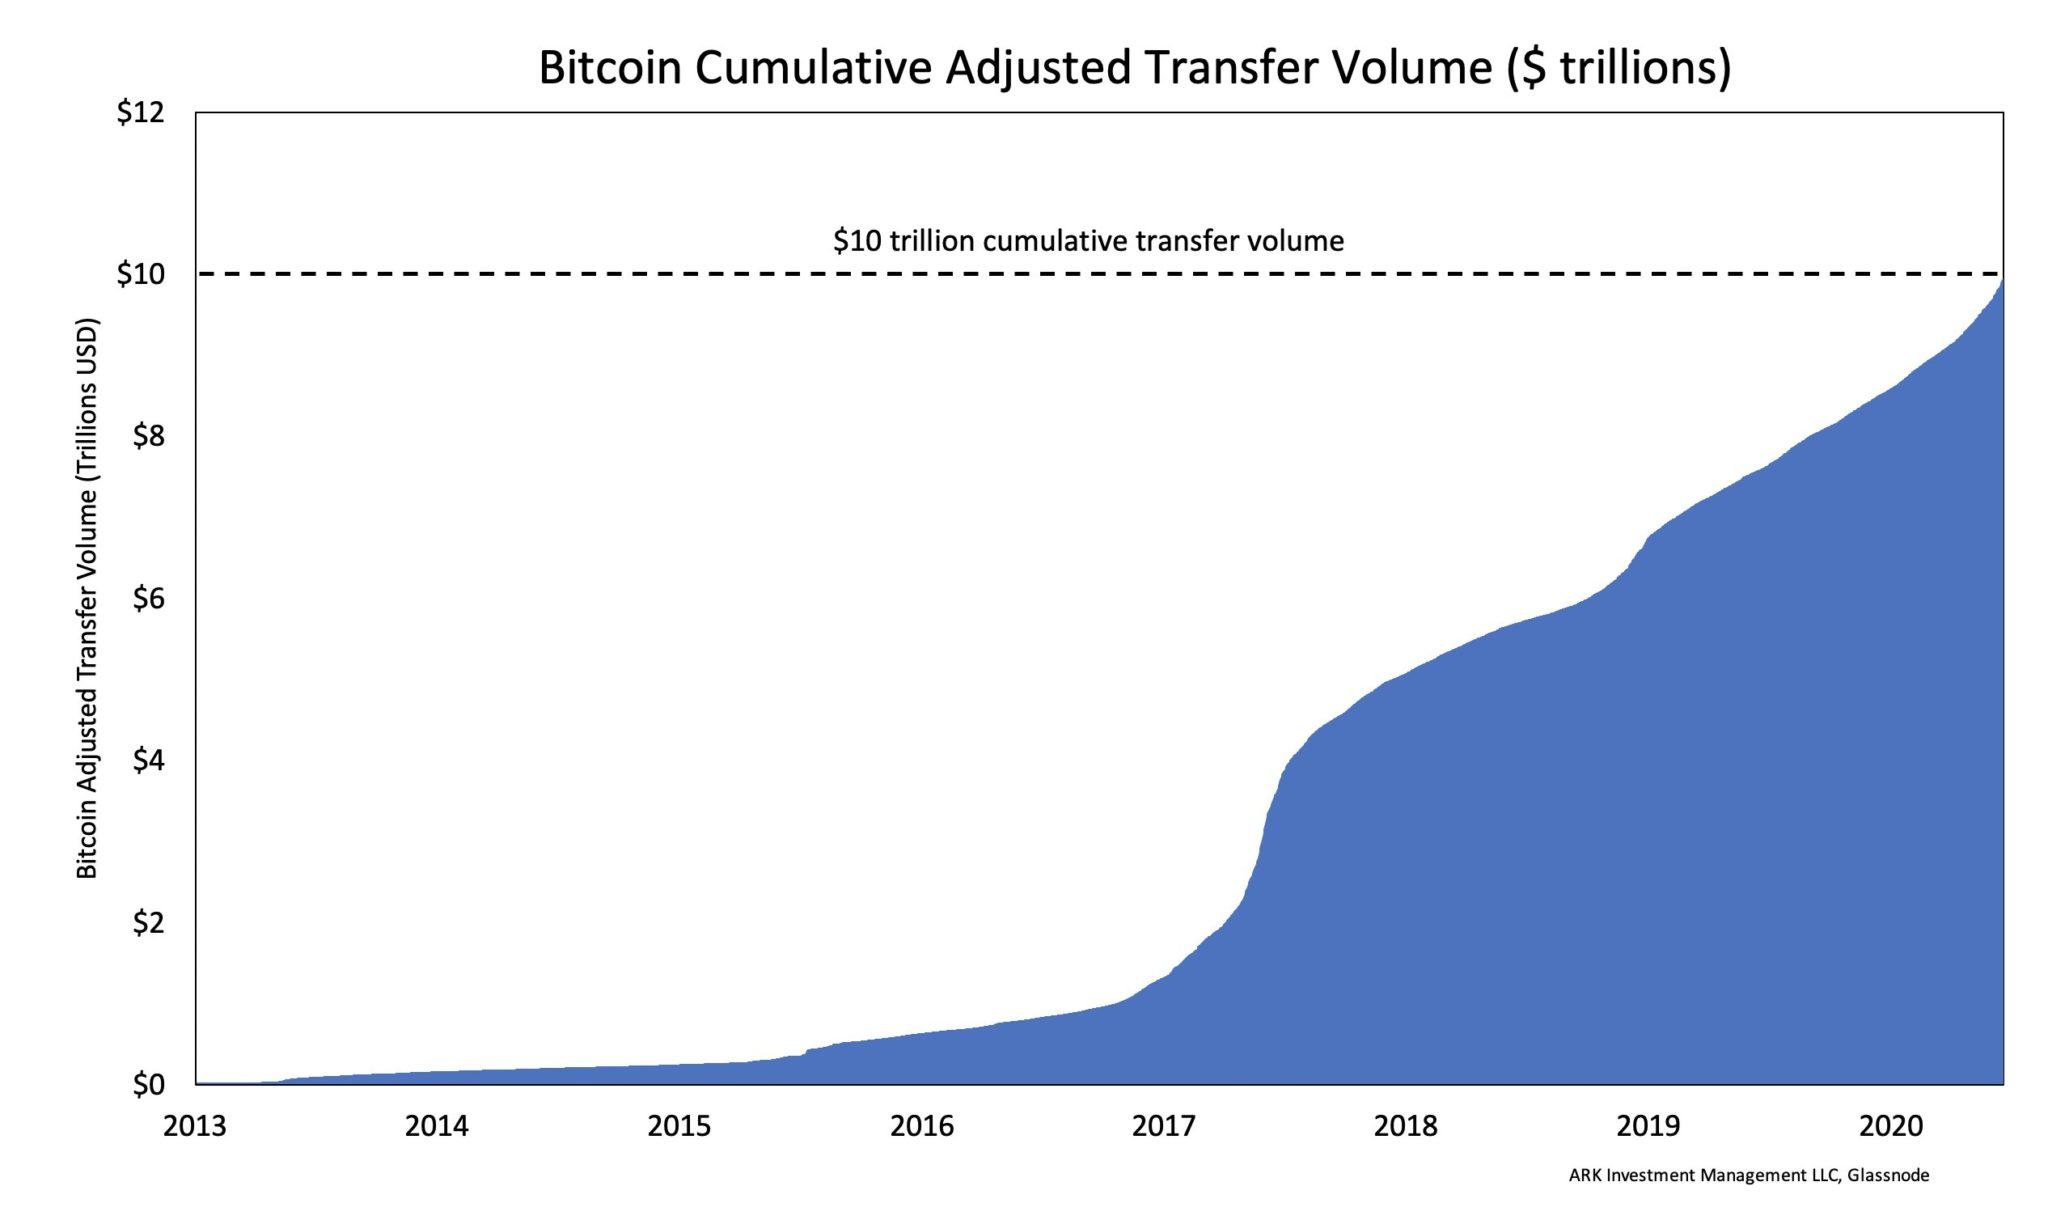 Volume cumulé de transactions en Bitcoin